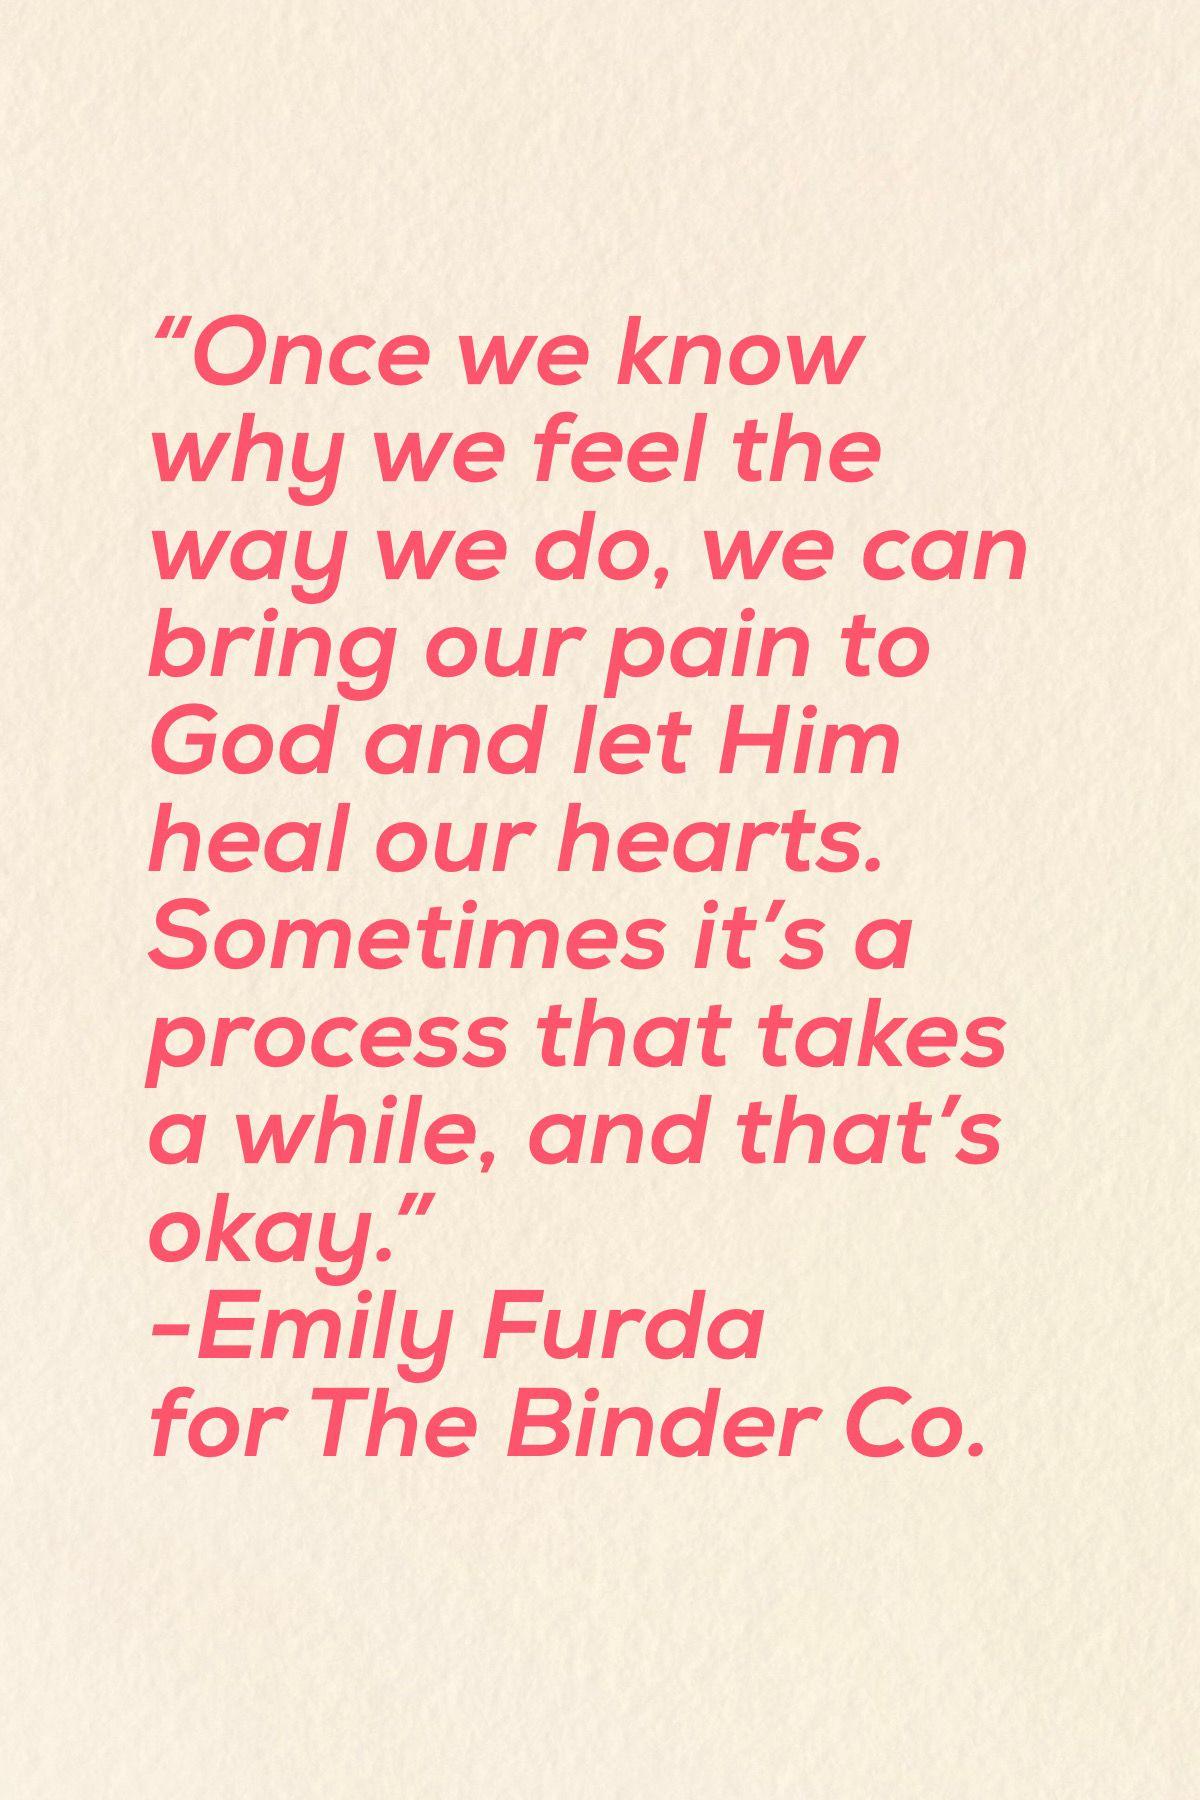 Emily Furda Quotes Prayer Quotes Hope Quotes Mental Health Quotes